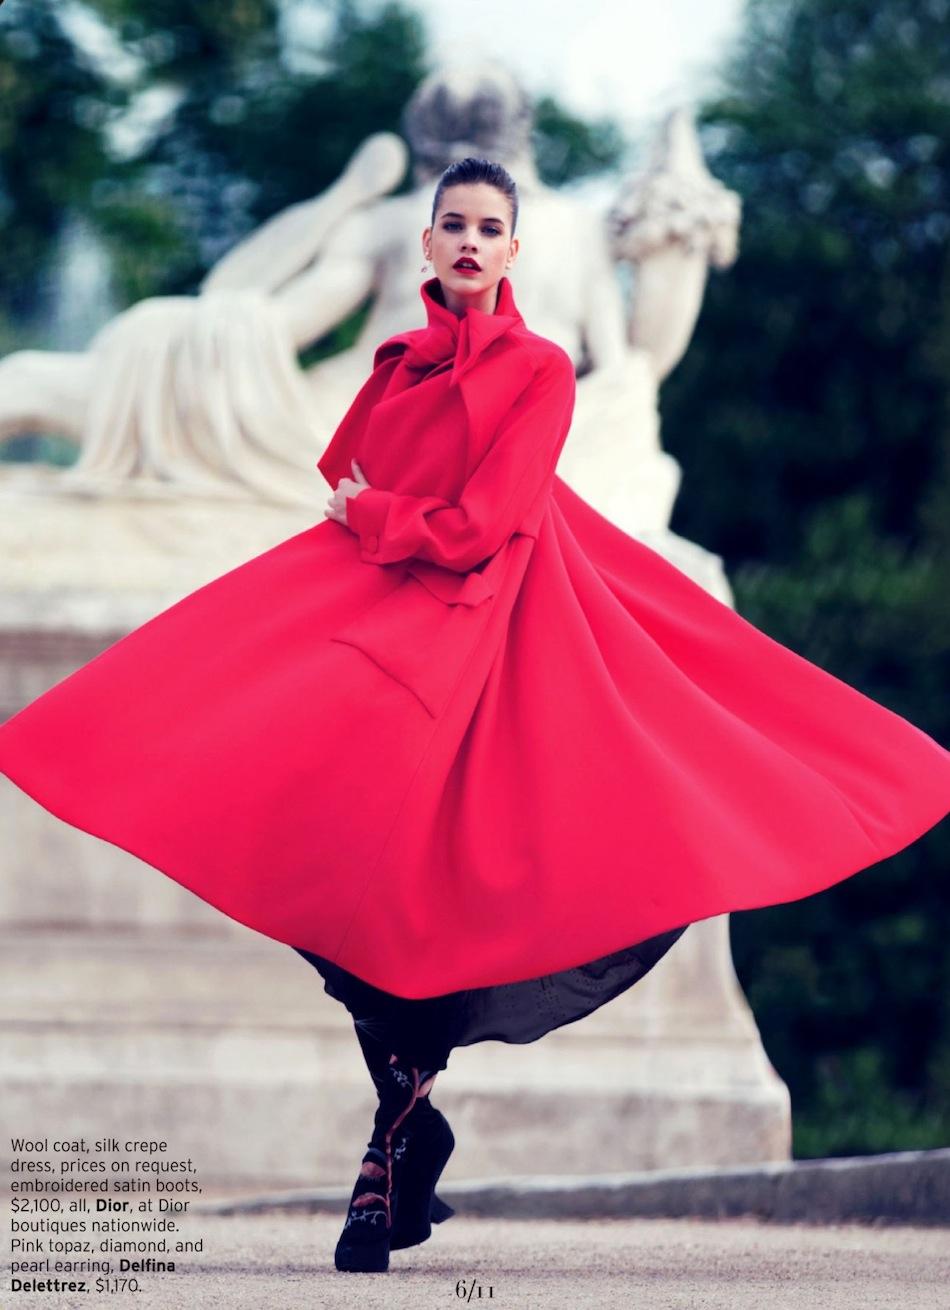 Barbara Palvin By David Bellemere For Elle US | August